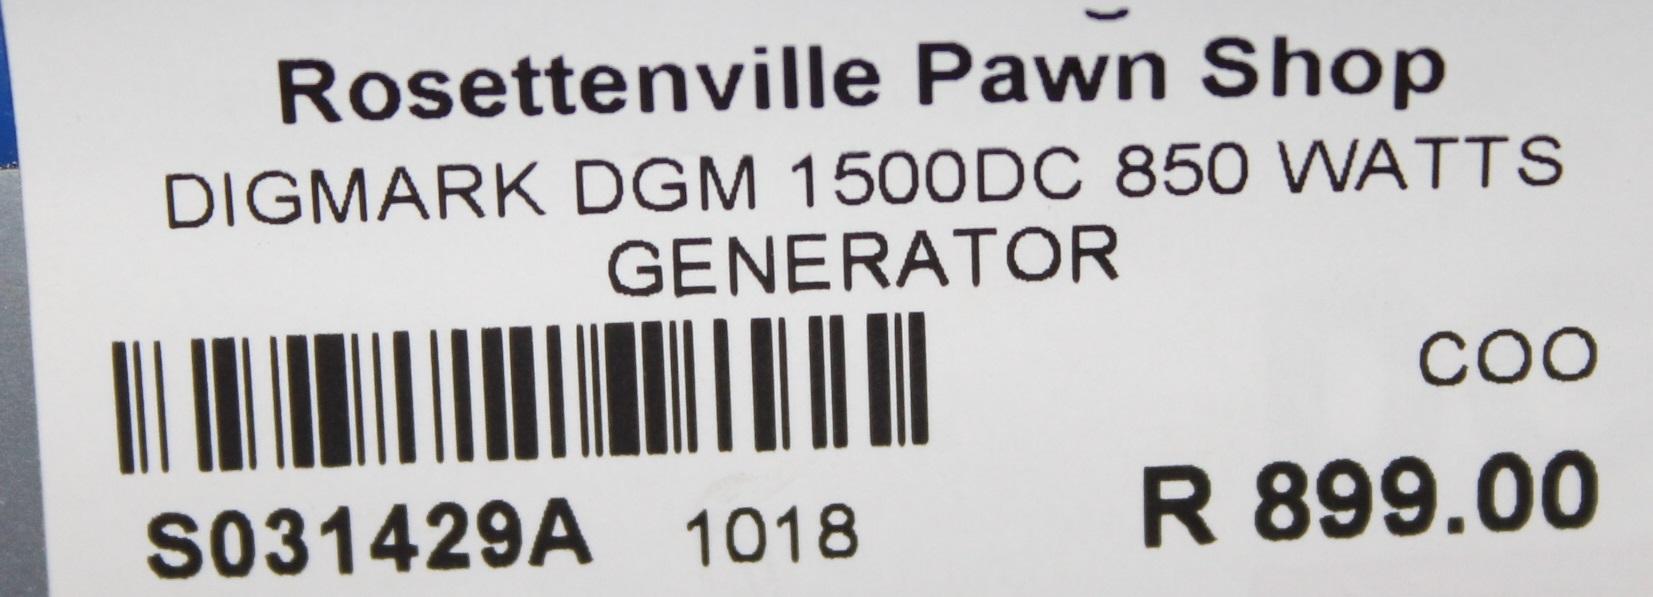 Digmark DGM 1500 DC 850Watts generator